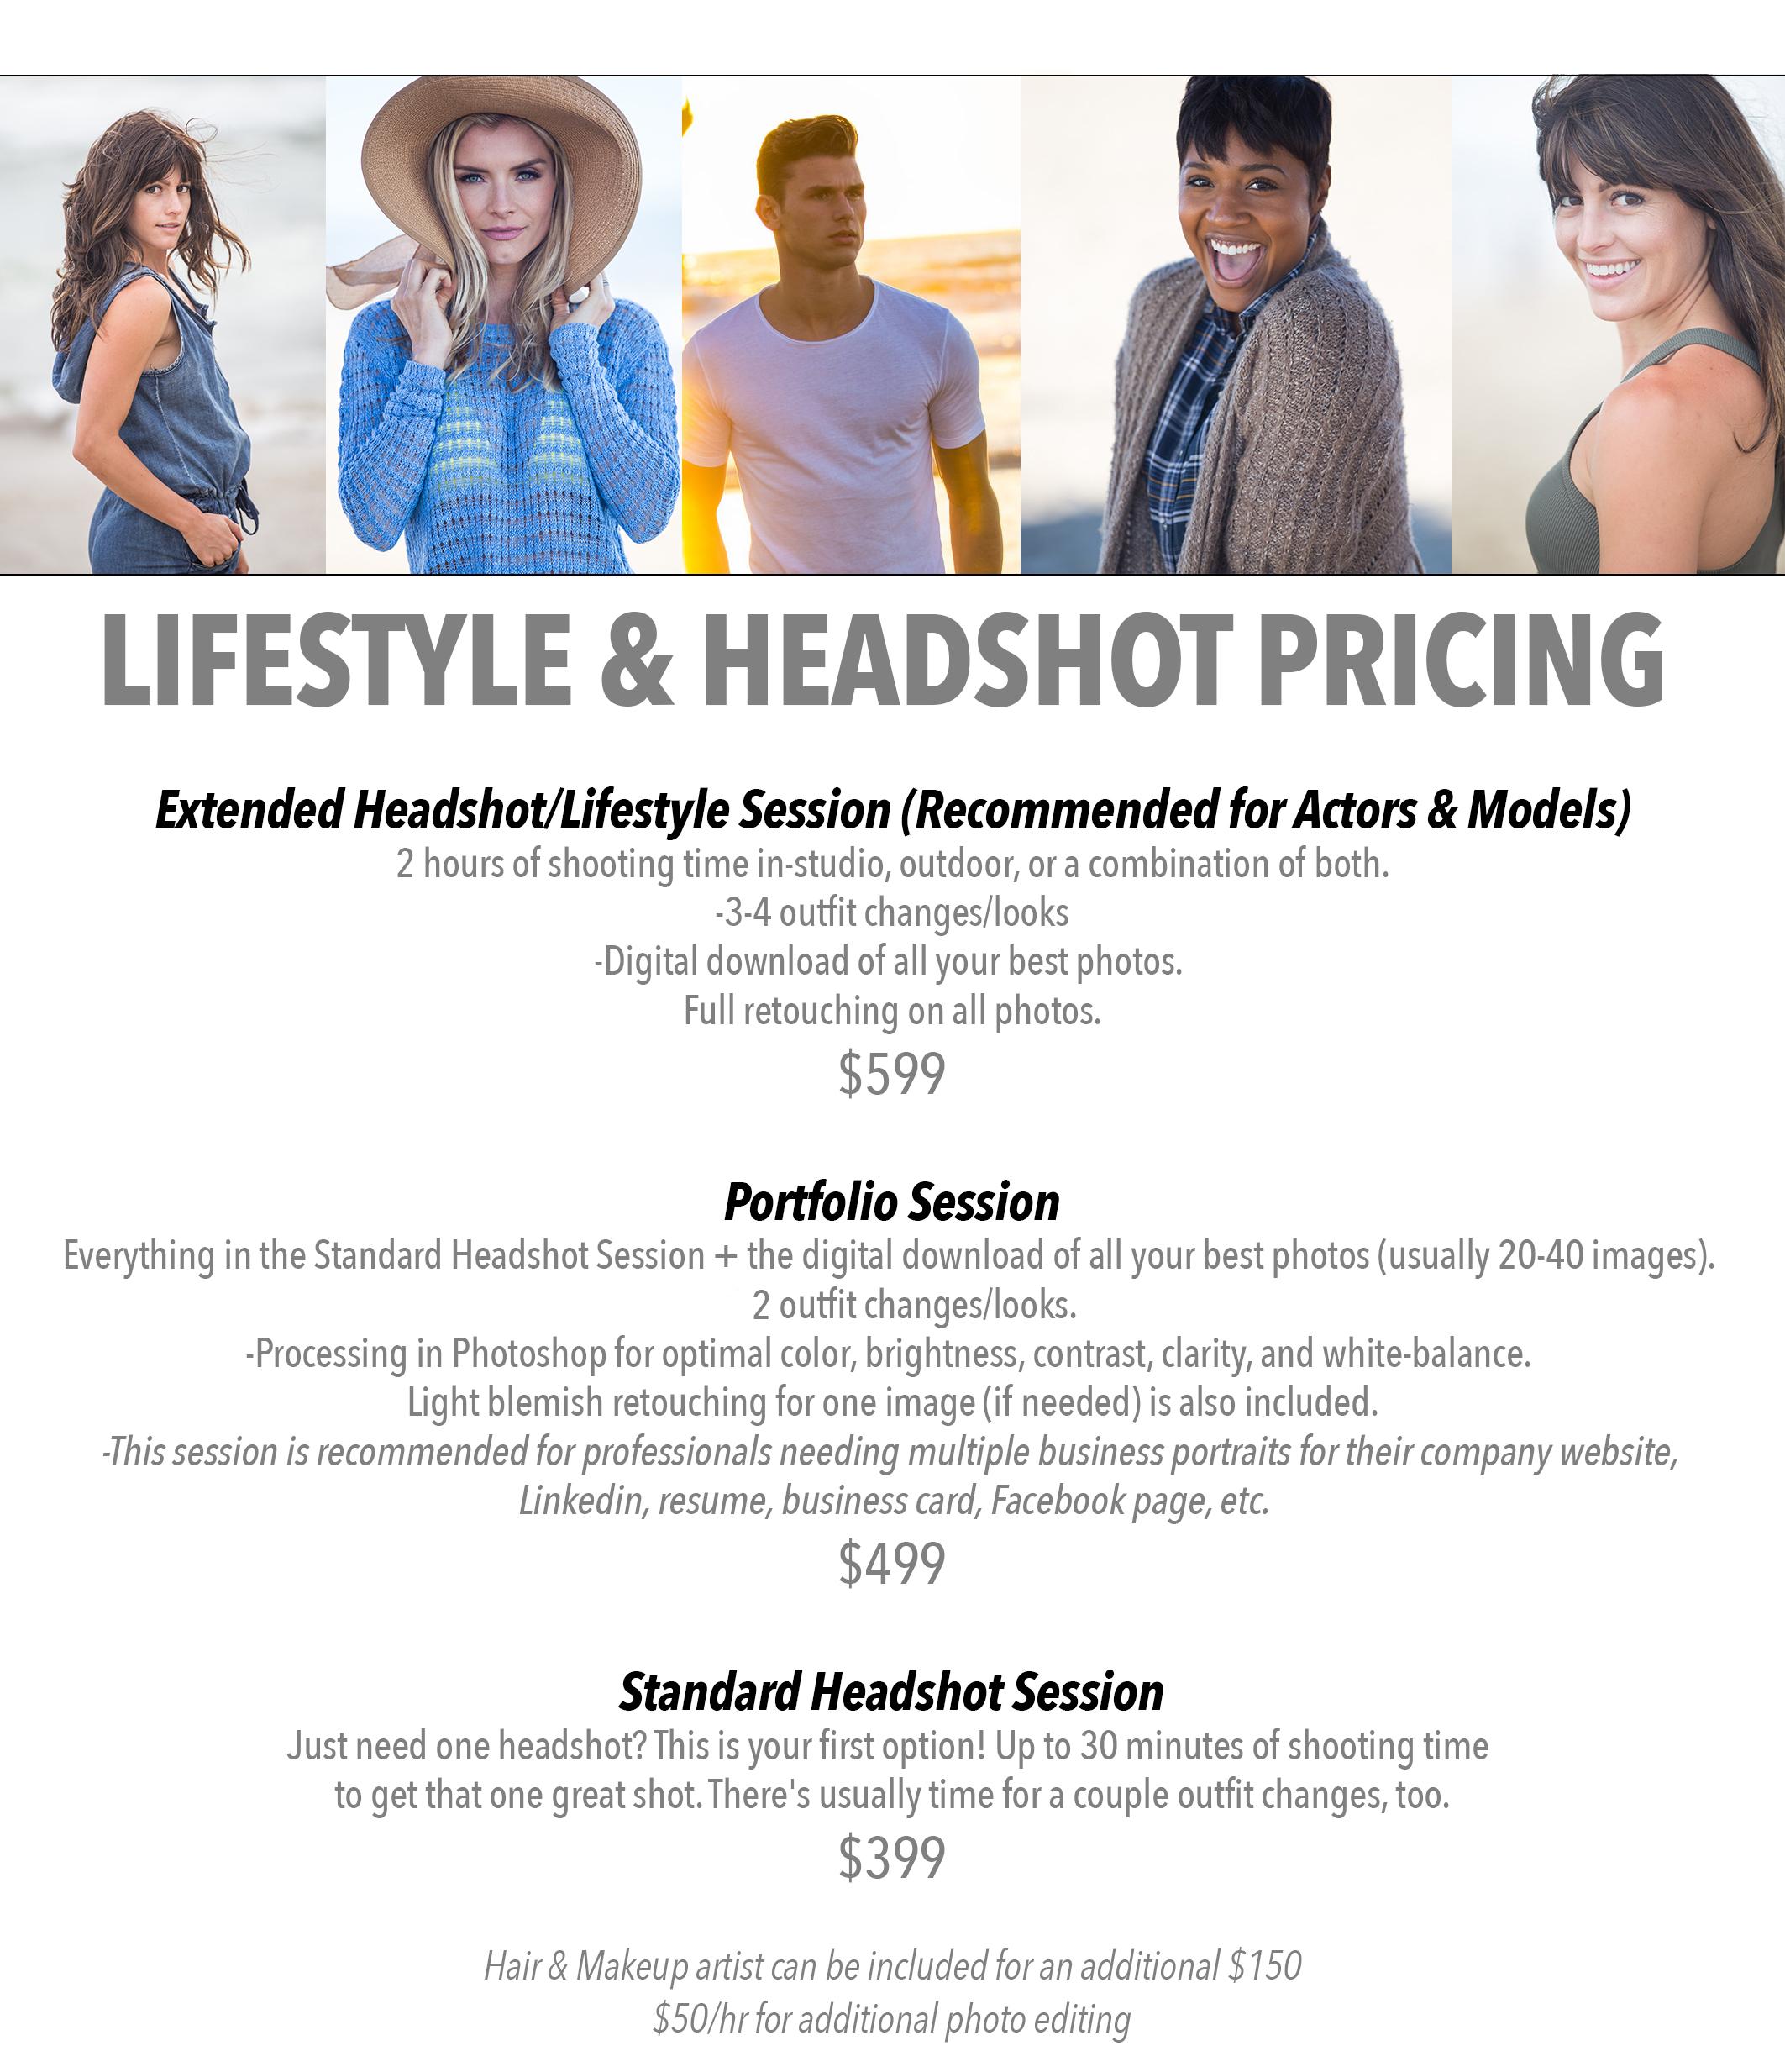 PricingSheetHeadshots.jpg